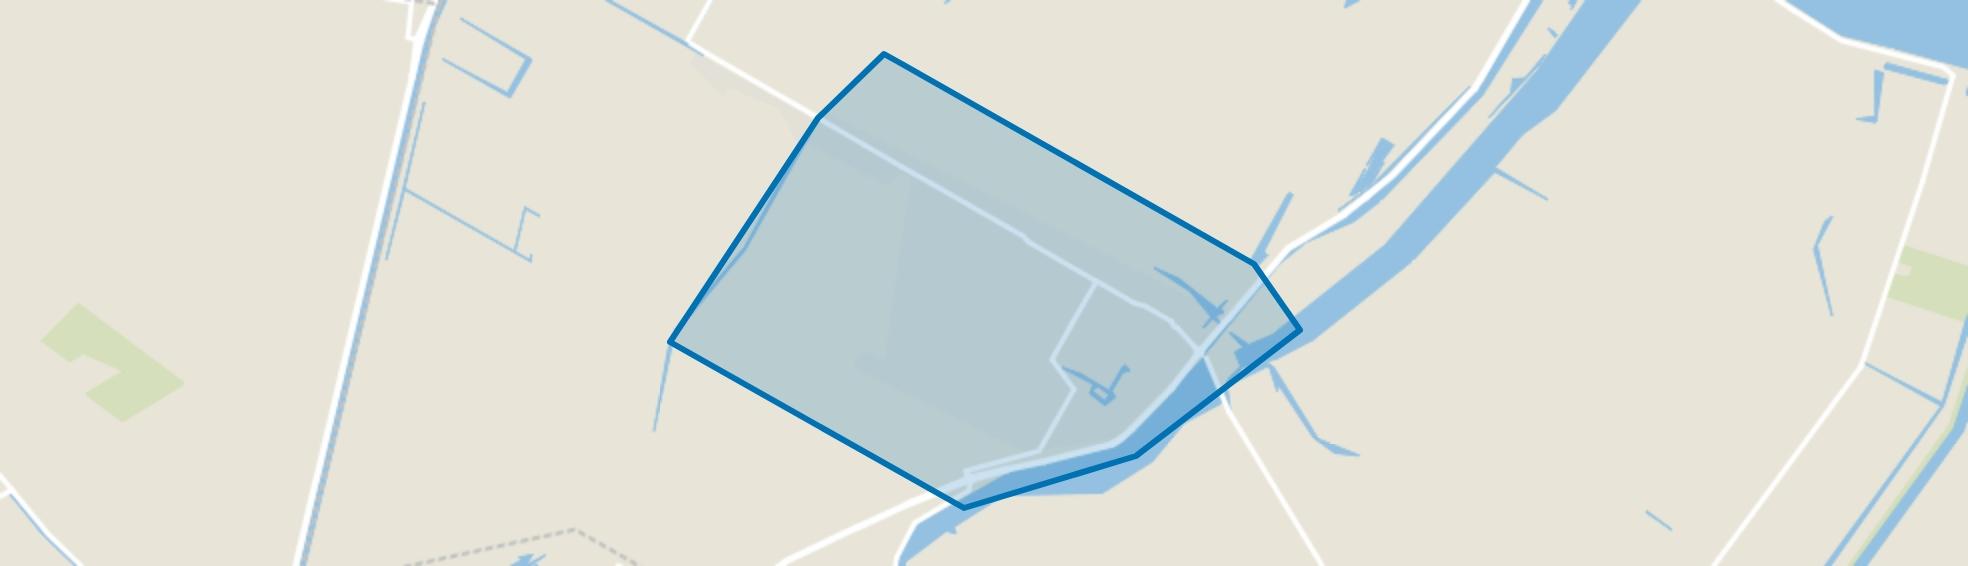 Kleine Sluis inclusief Spoorbuurt, Anna Paulowna map